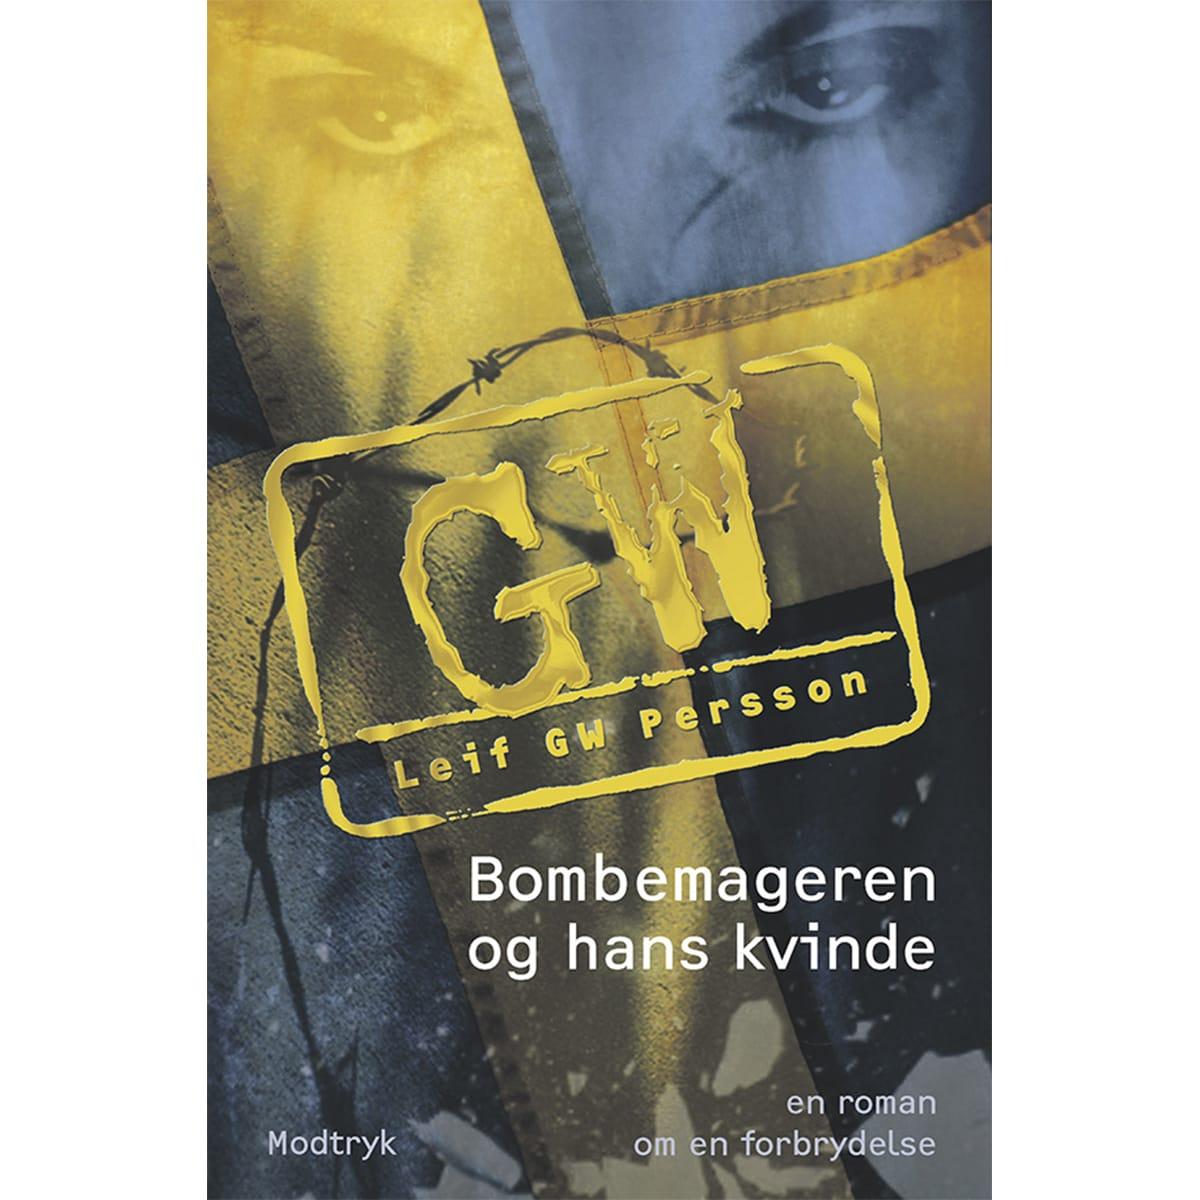 Af Leif G. W. Persson